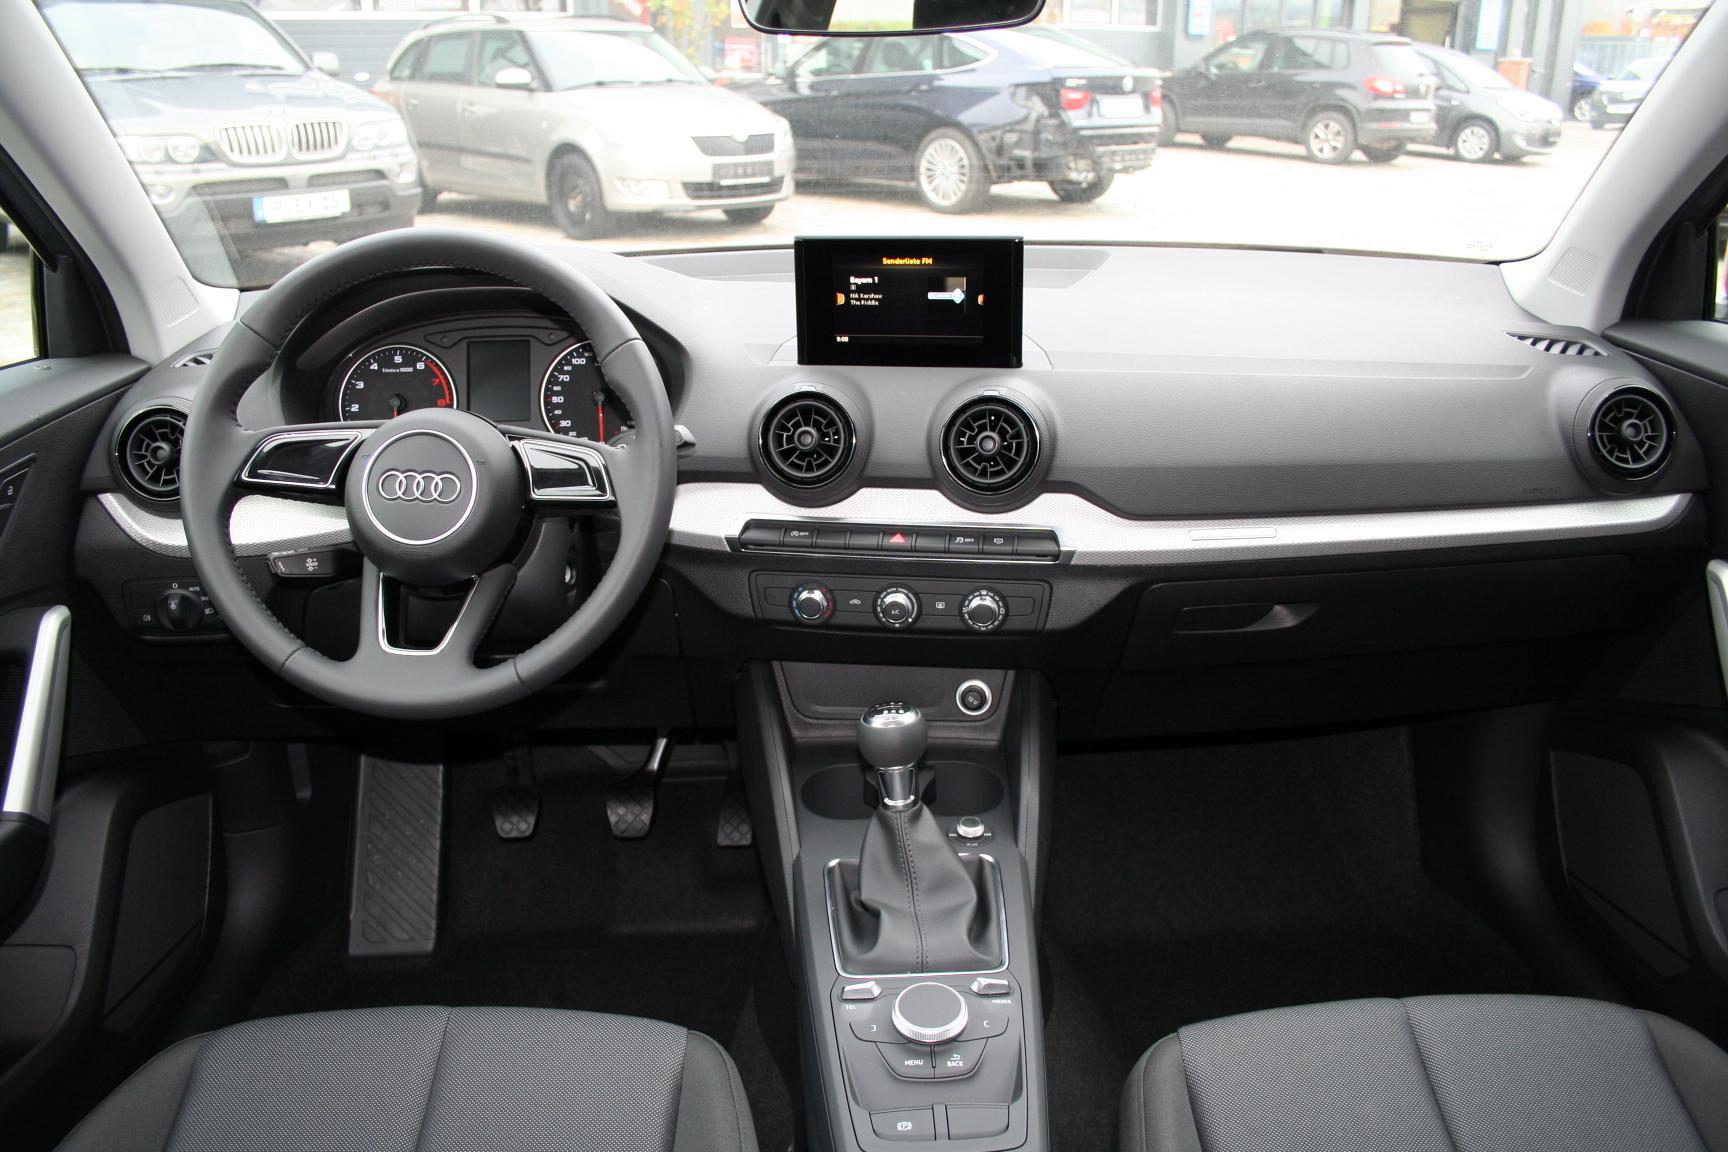 Audi q2 1 0 tfsi 116 ps brand neu climatronic 4 jahre for Interieur q2